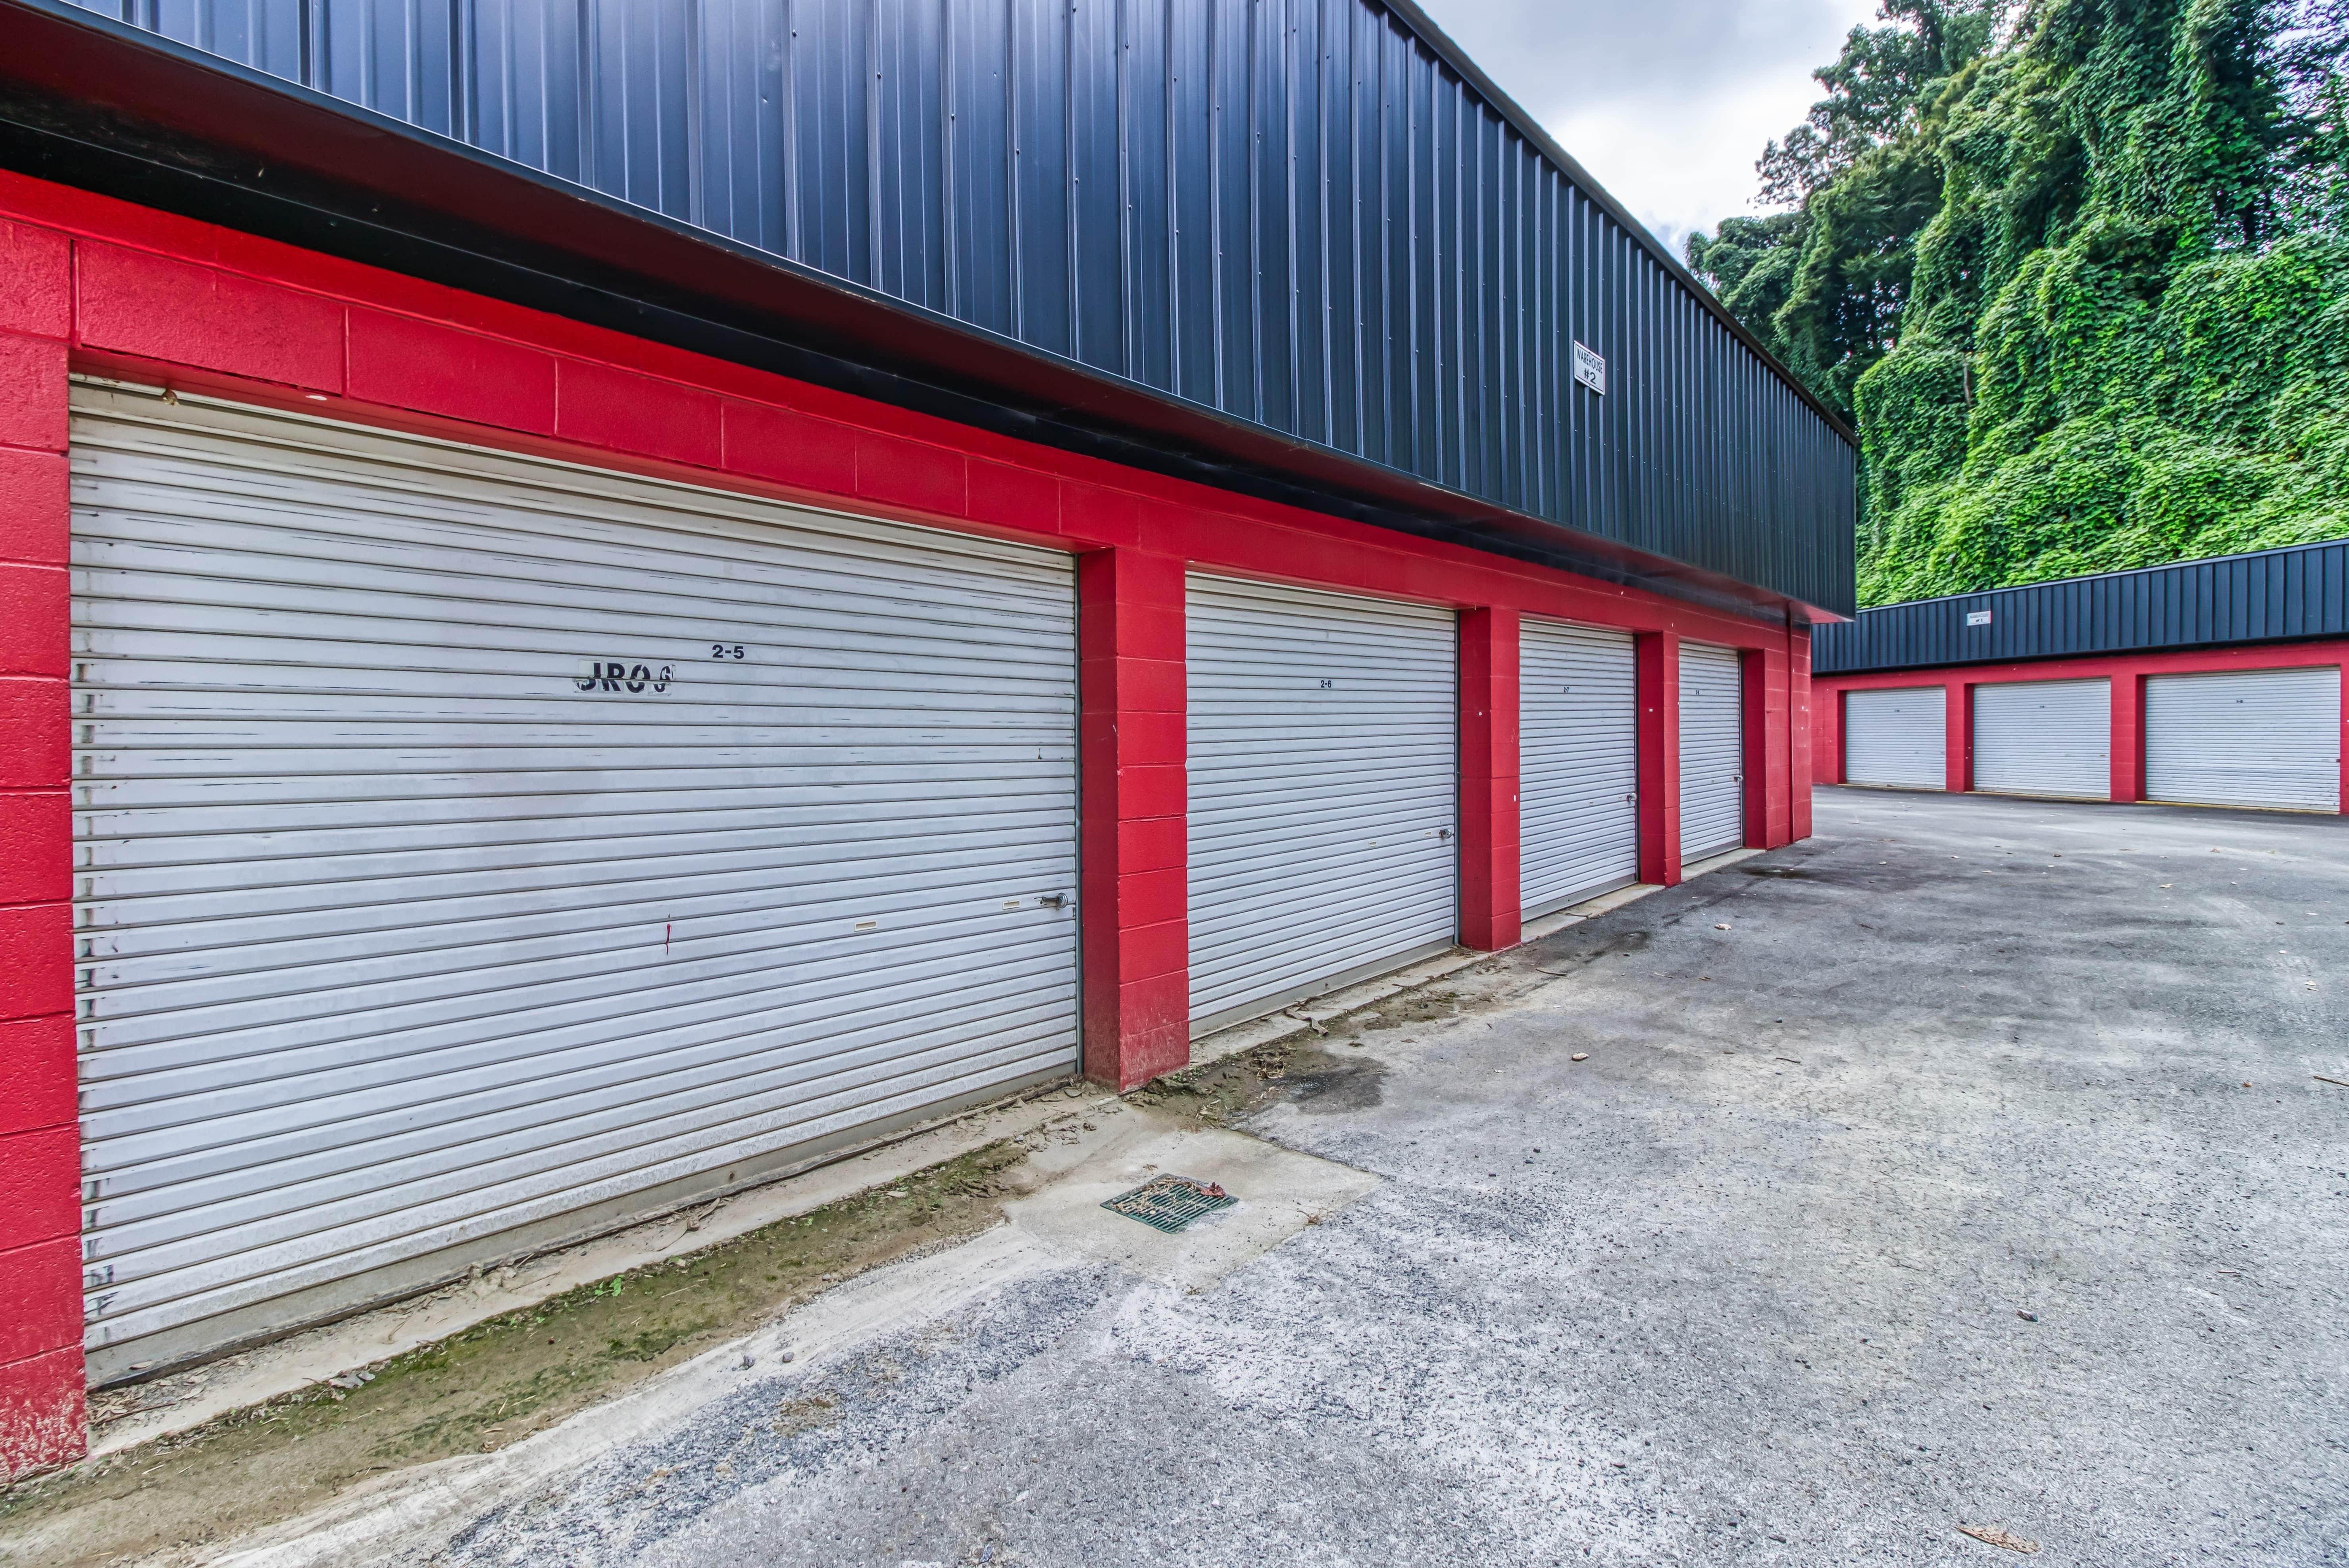 Large Self Storage in Ellijay GA